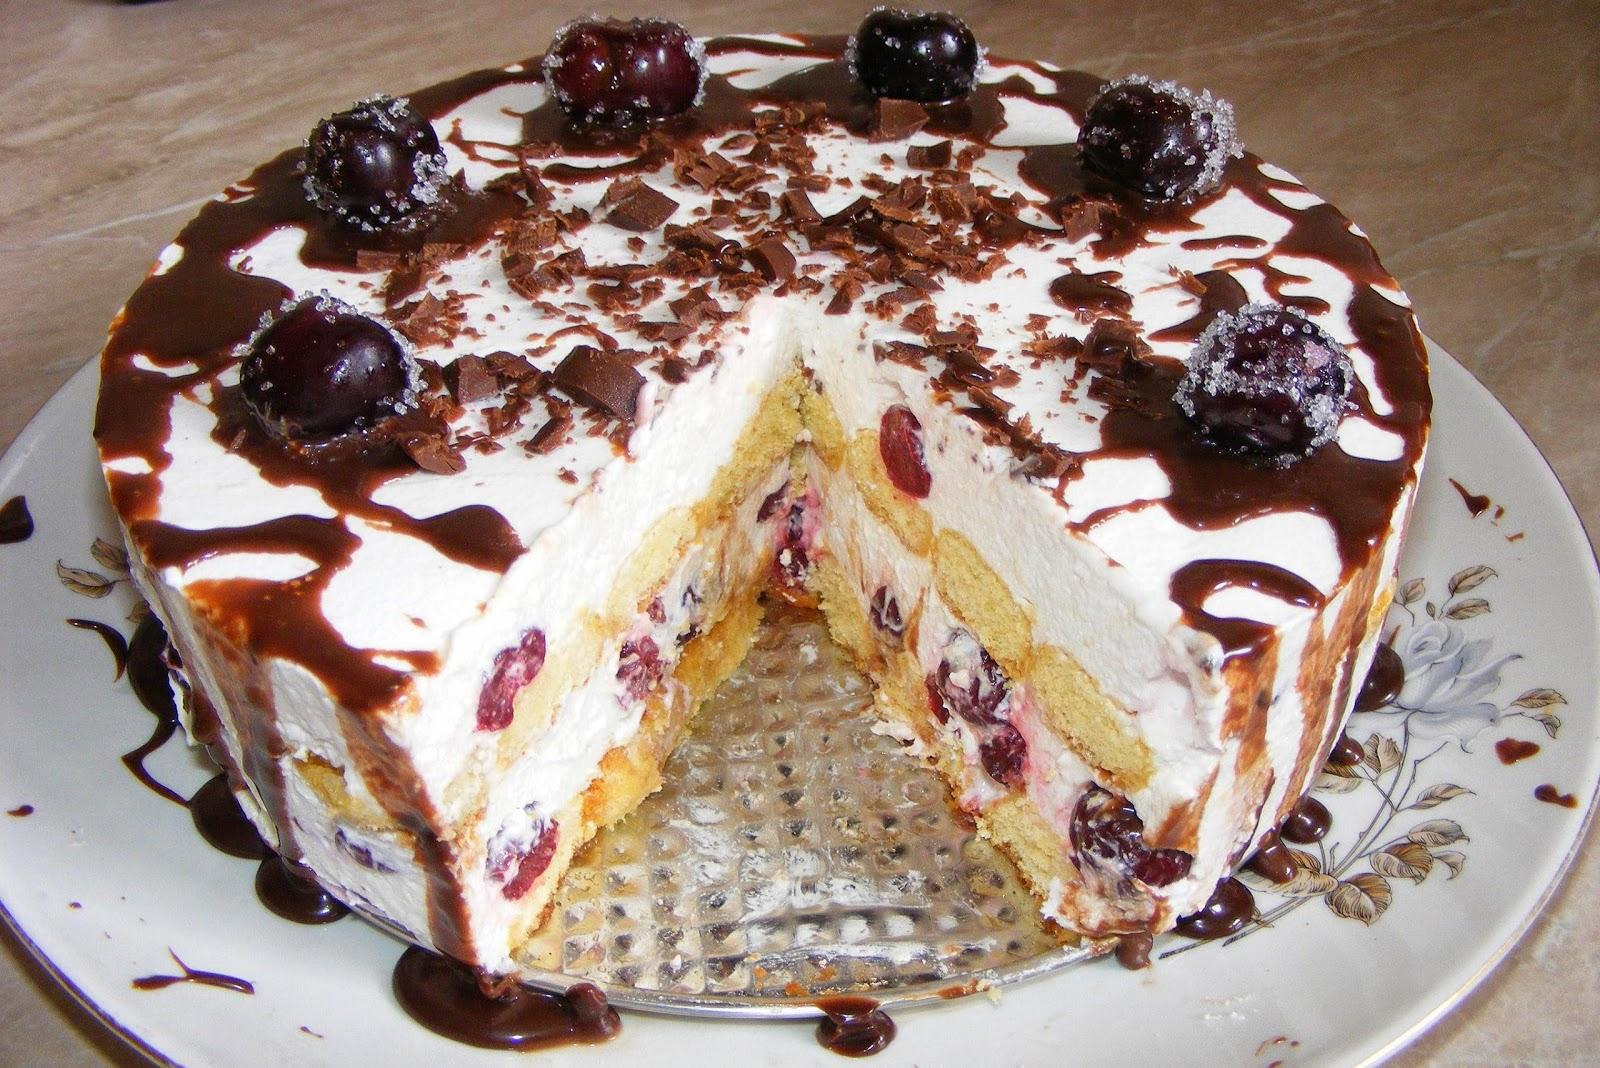 tort, torturi, prajitura, prajituri, dulciuri, deserturi, tort cu visine, tort cu piscoturi, tort de visine si piscoturi, prajitura cu visine, tort cu fructe, reteta tort, retete de tort, retete torturi, torturi de casa, retete culinare, preparate culinare,